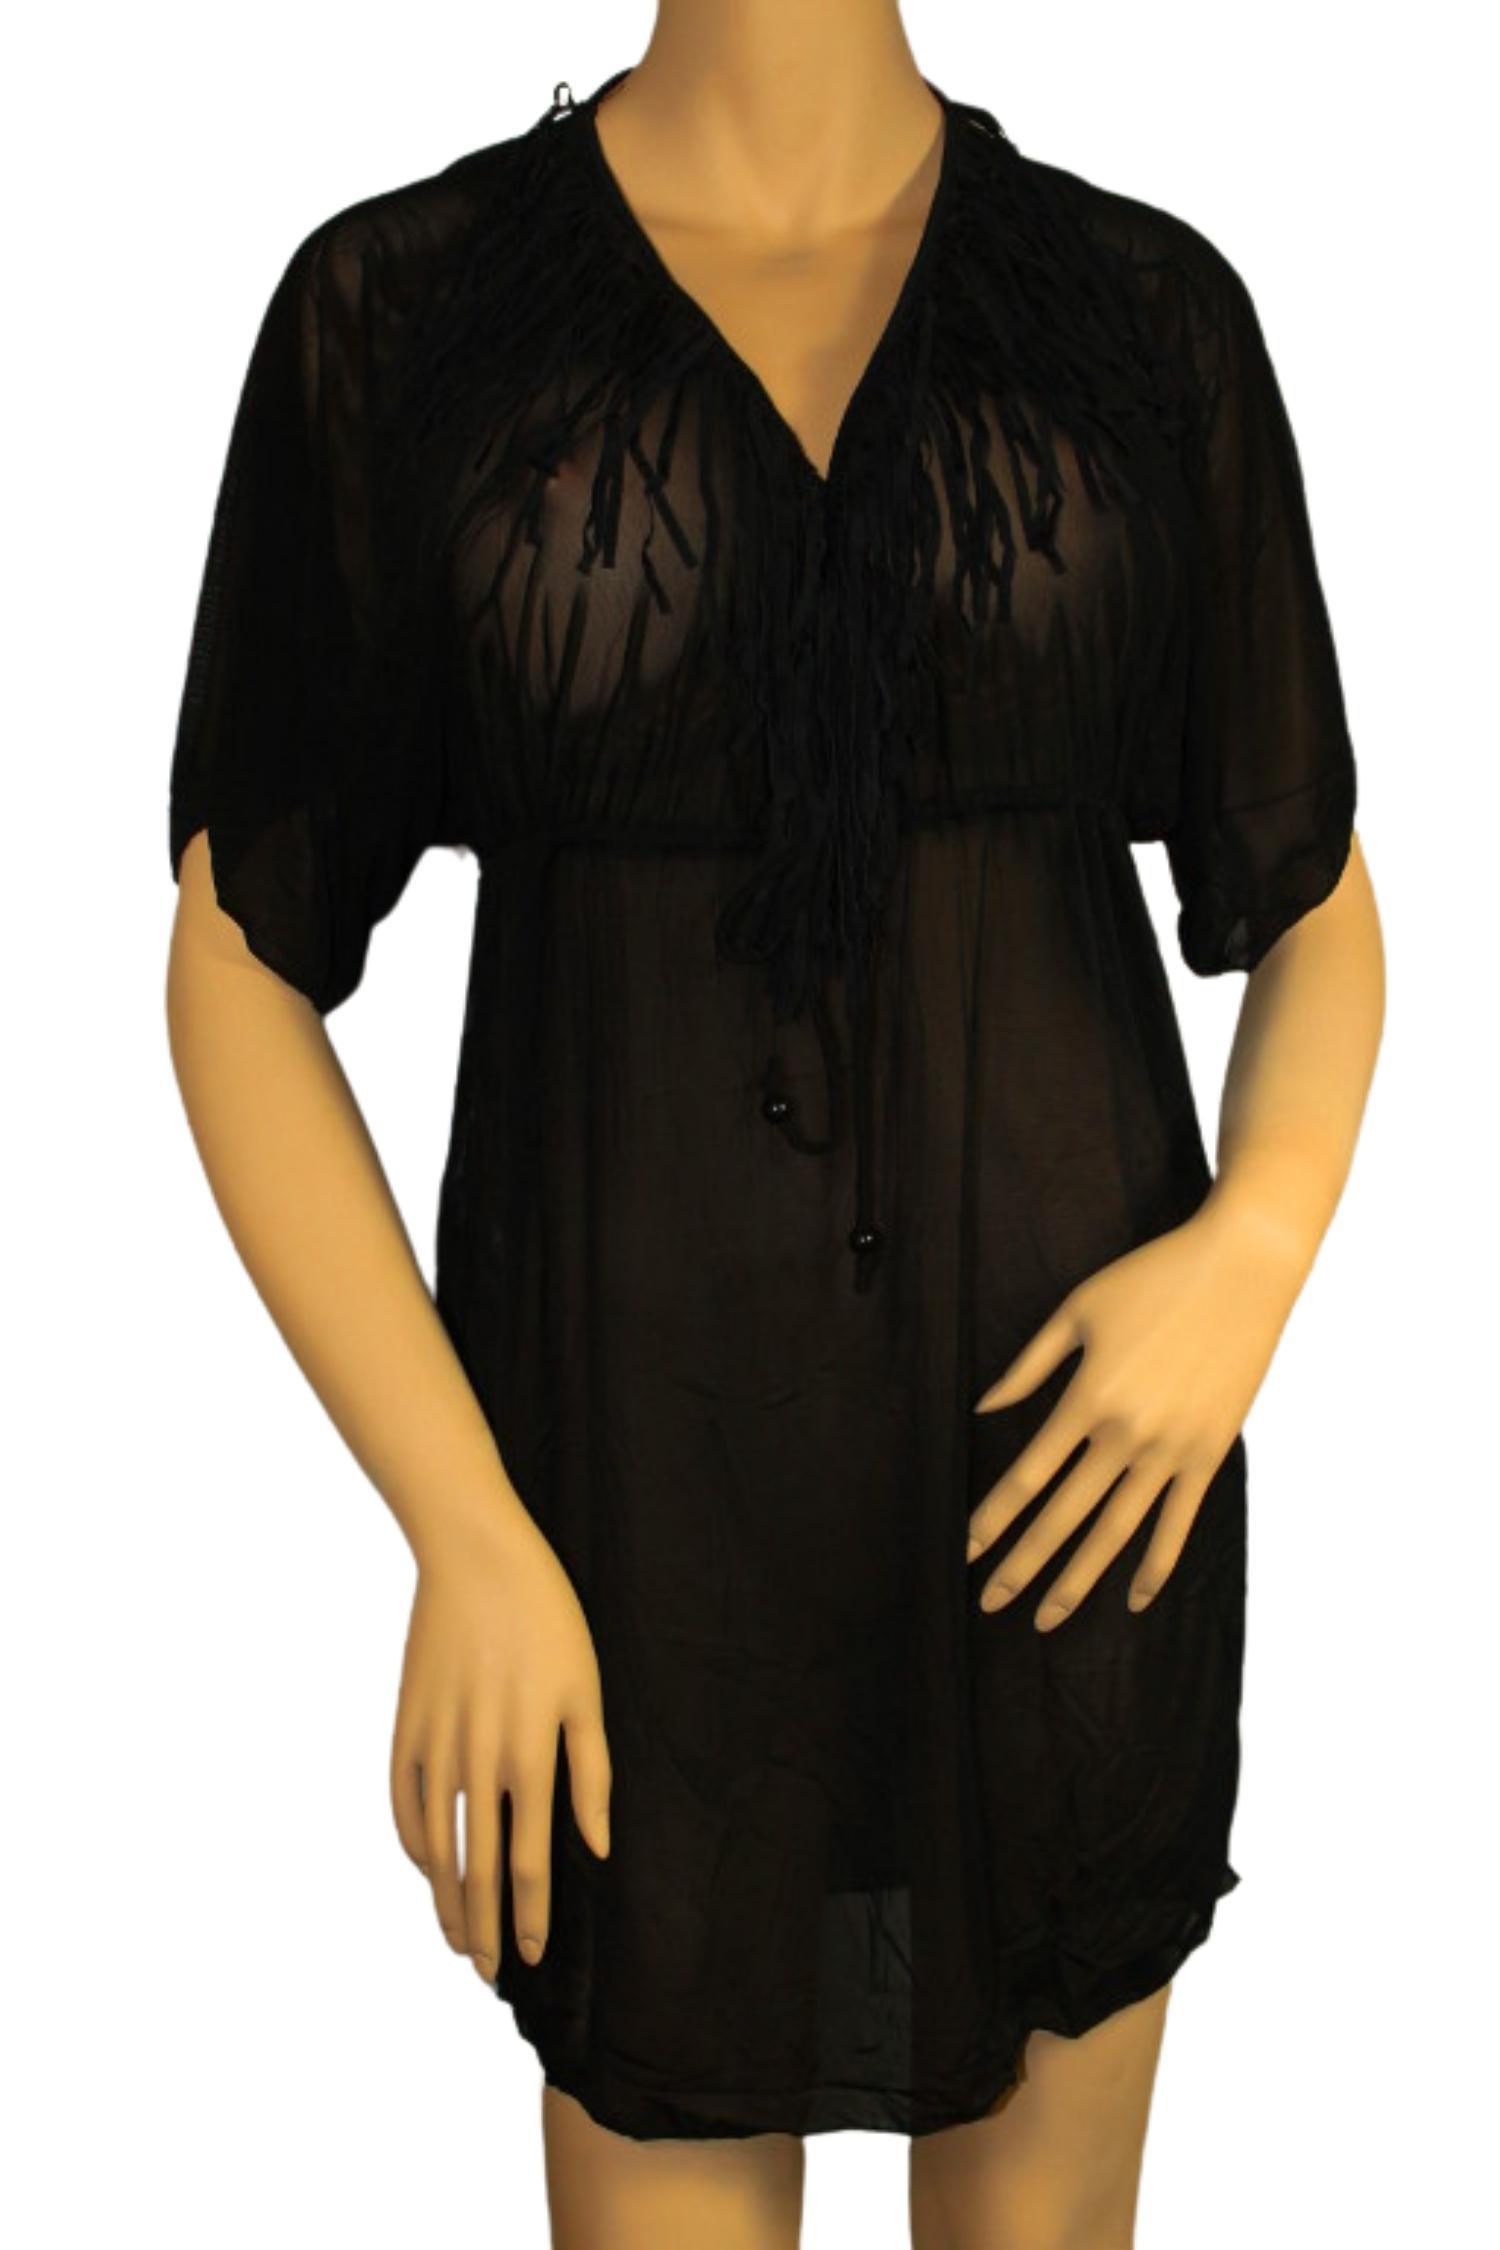 Gabana Black tunikové šaty na plavky XL černá